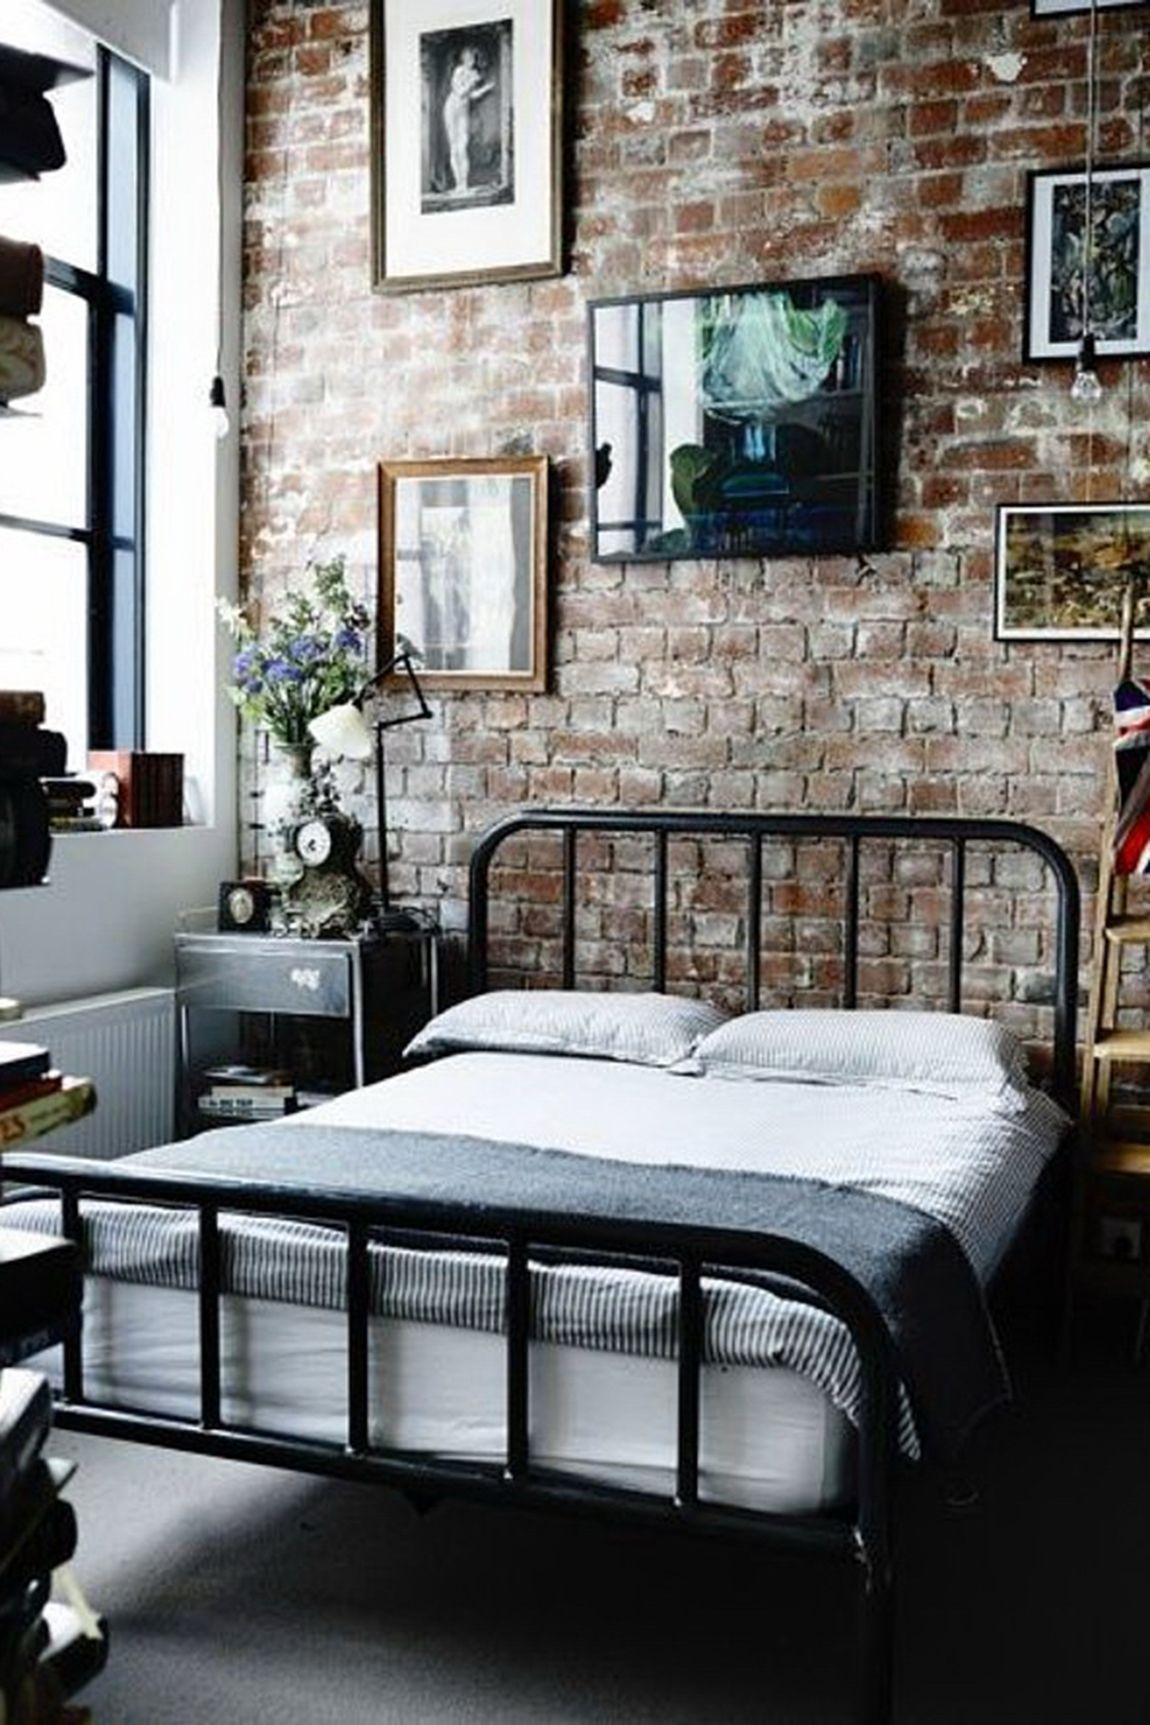 Vintage wohnideen vitange yatak odası  vintage wohnideen  pinterest  industrial